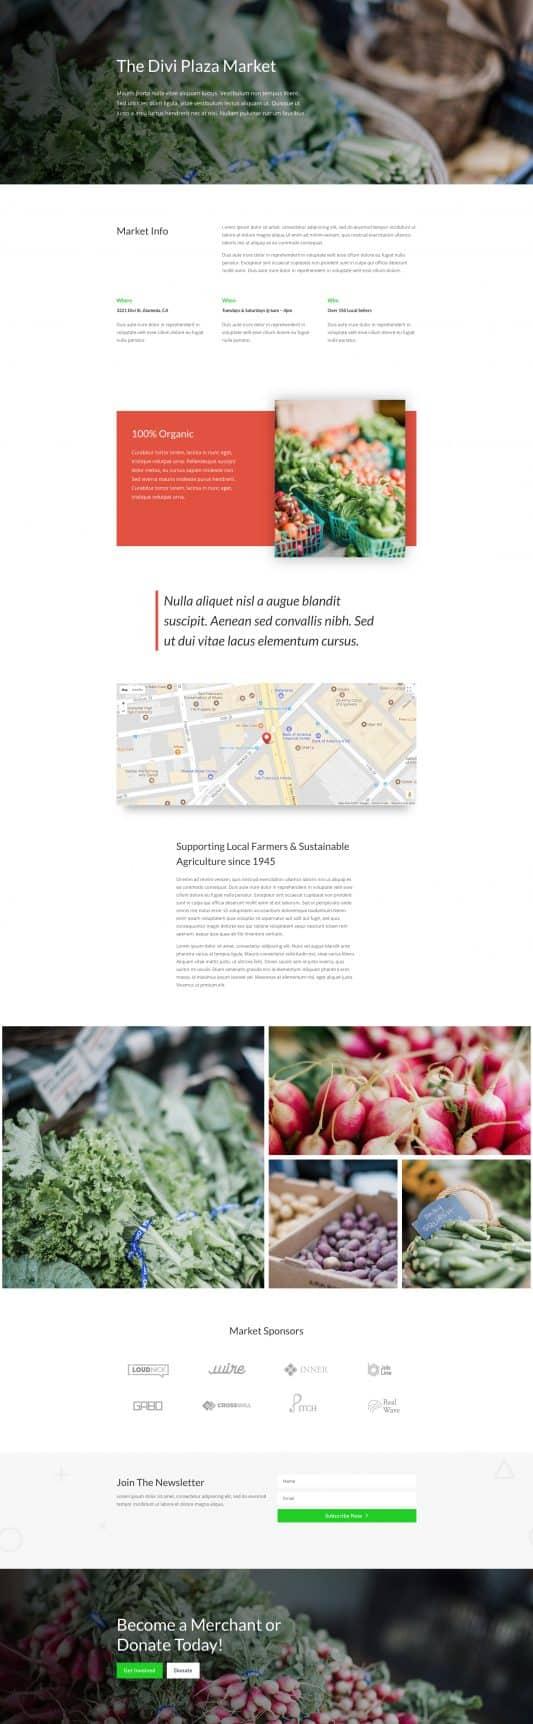 Farmers Market Web Design 8